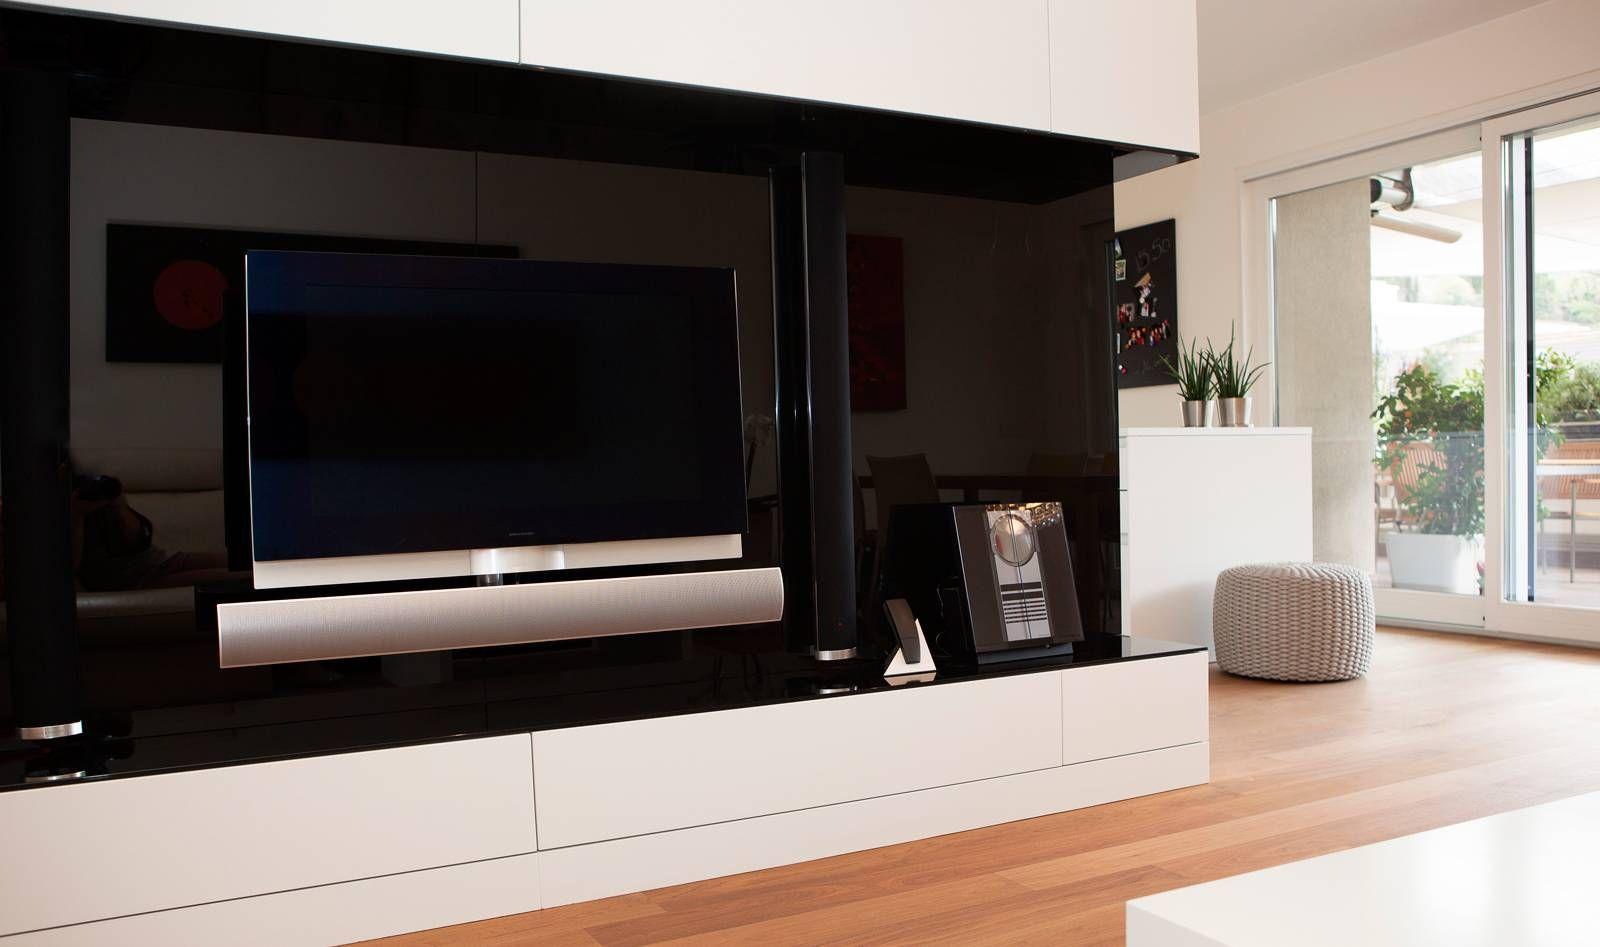 Plano y dise o de interiores de apartamento moderno for Muebles exterior diseno moderno